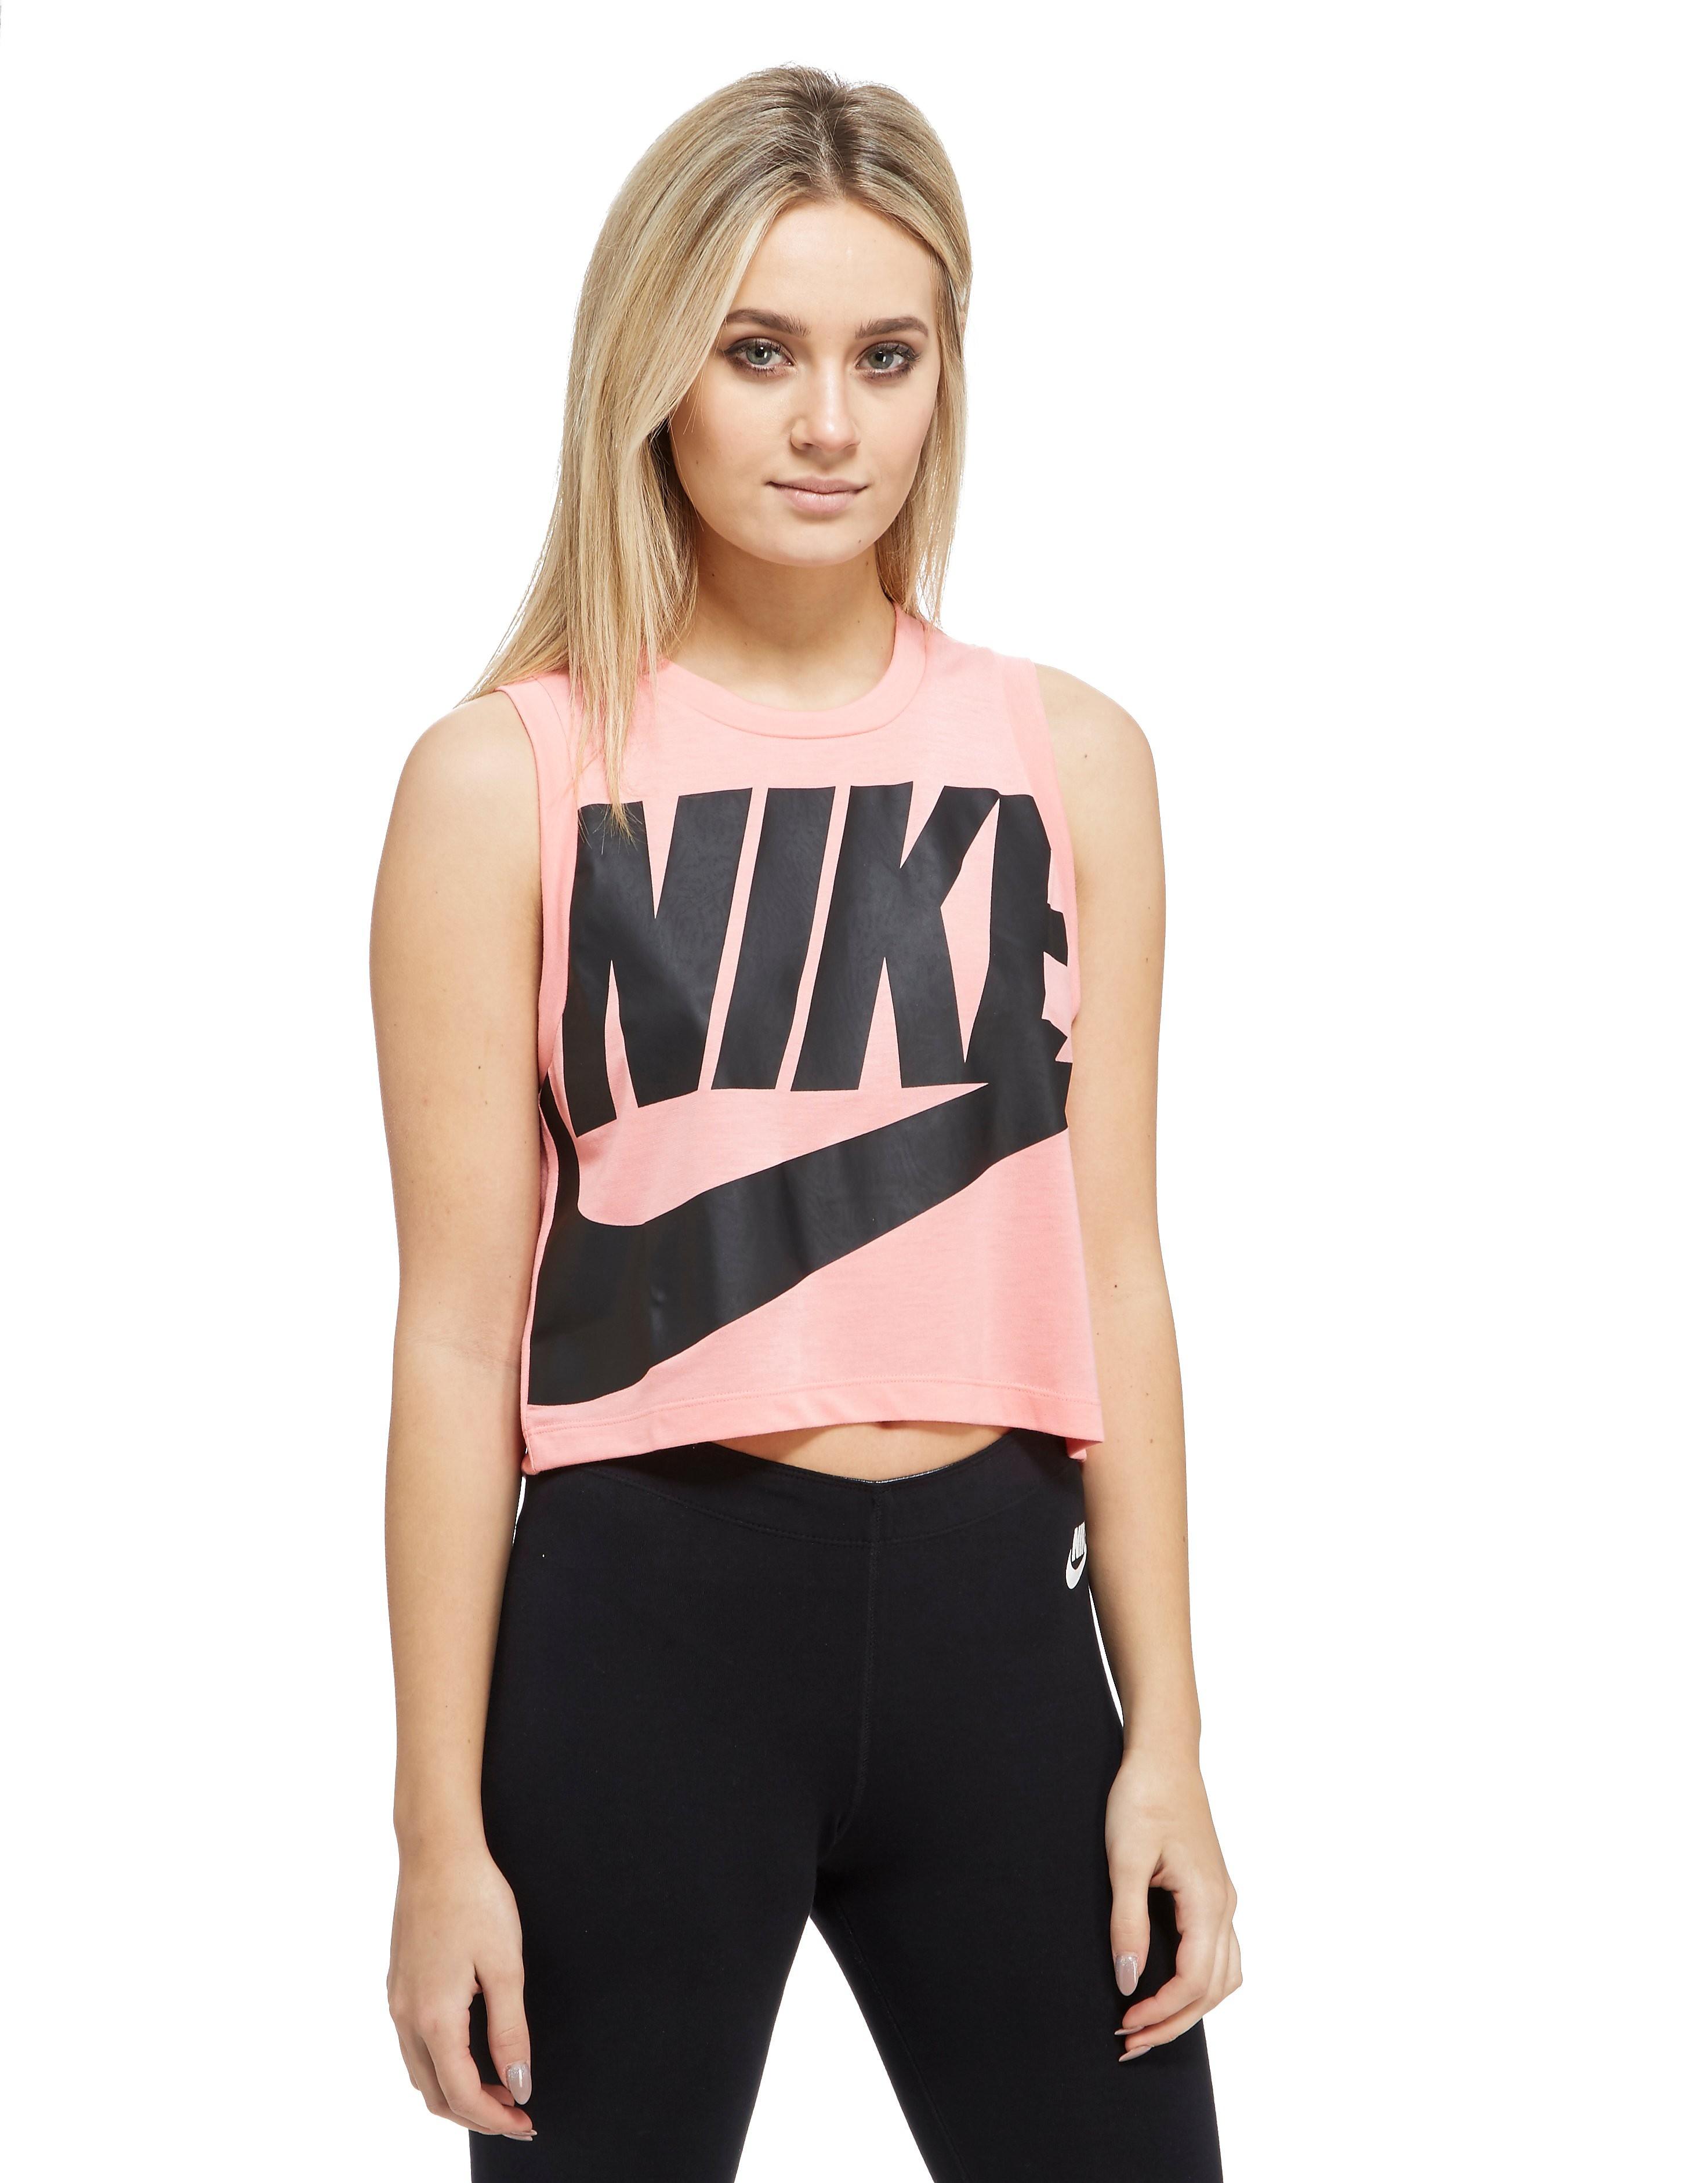 Nike Crop Sleeveless Top